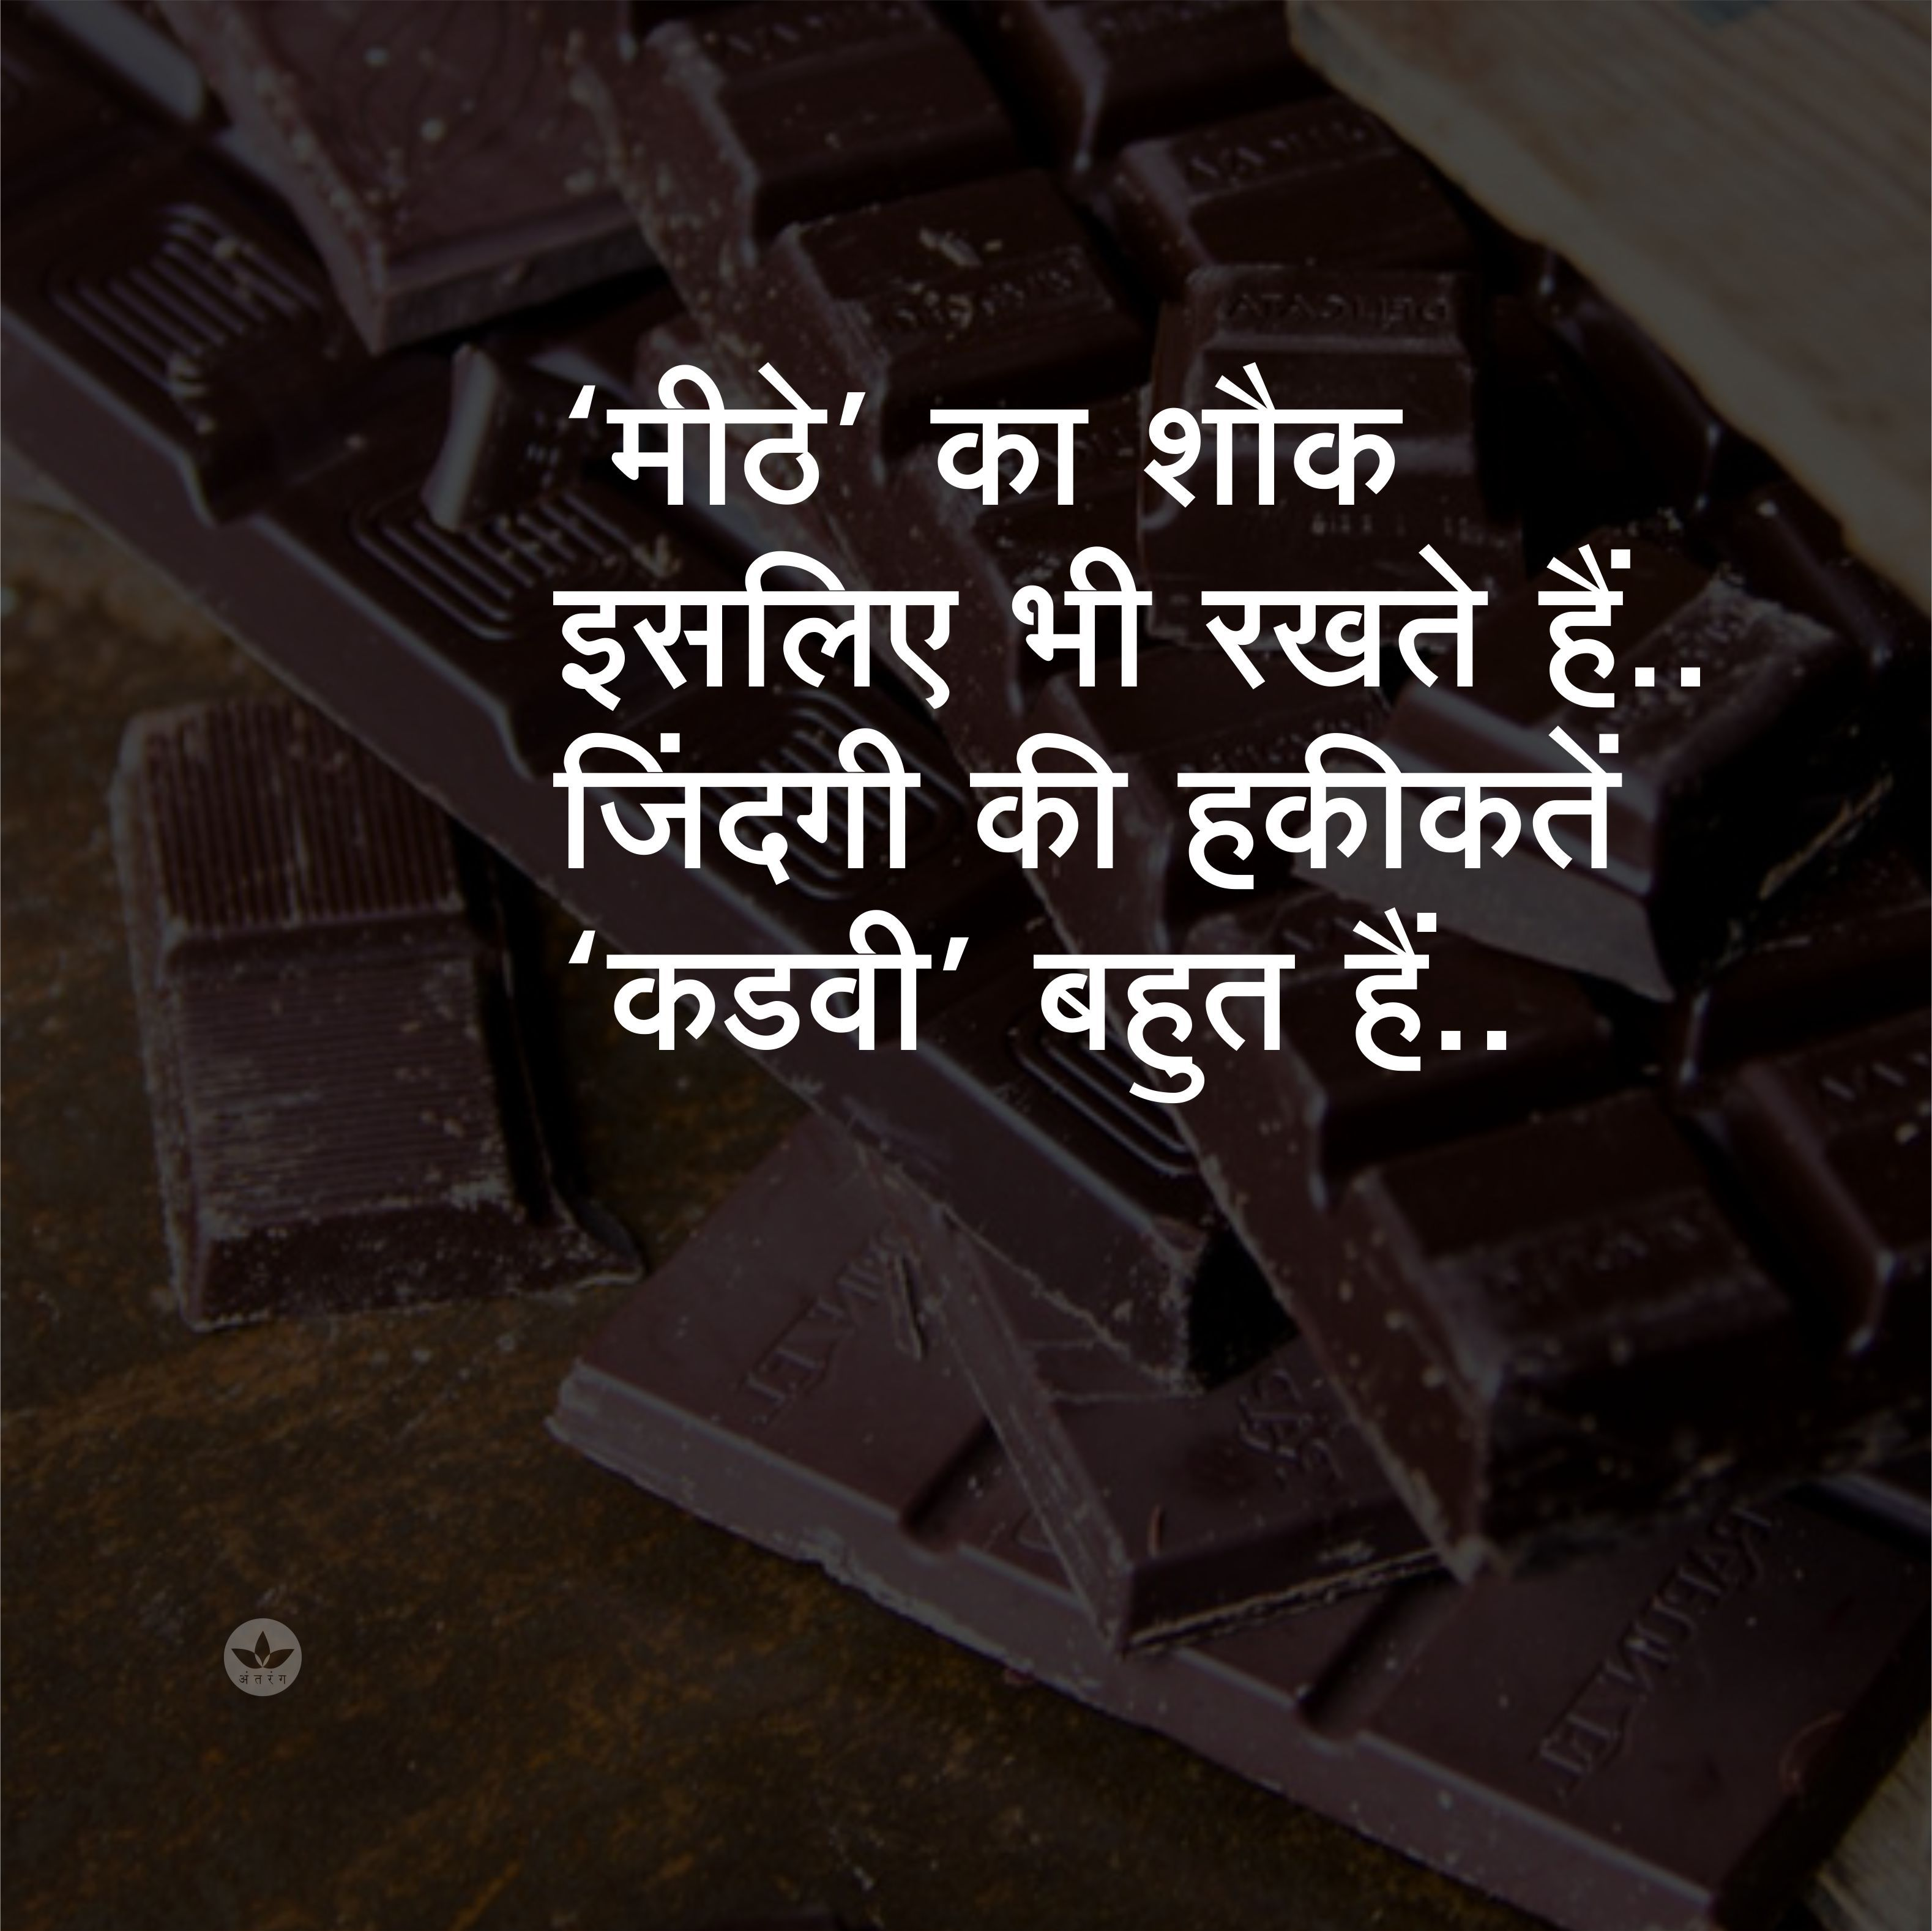 हिंदी शायरी-Best Hindi Shayari SMS, Status, Images